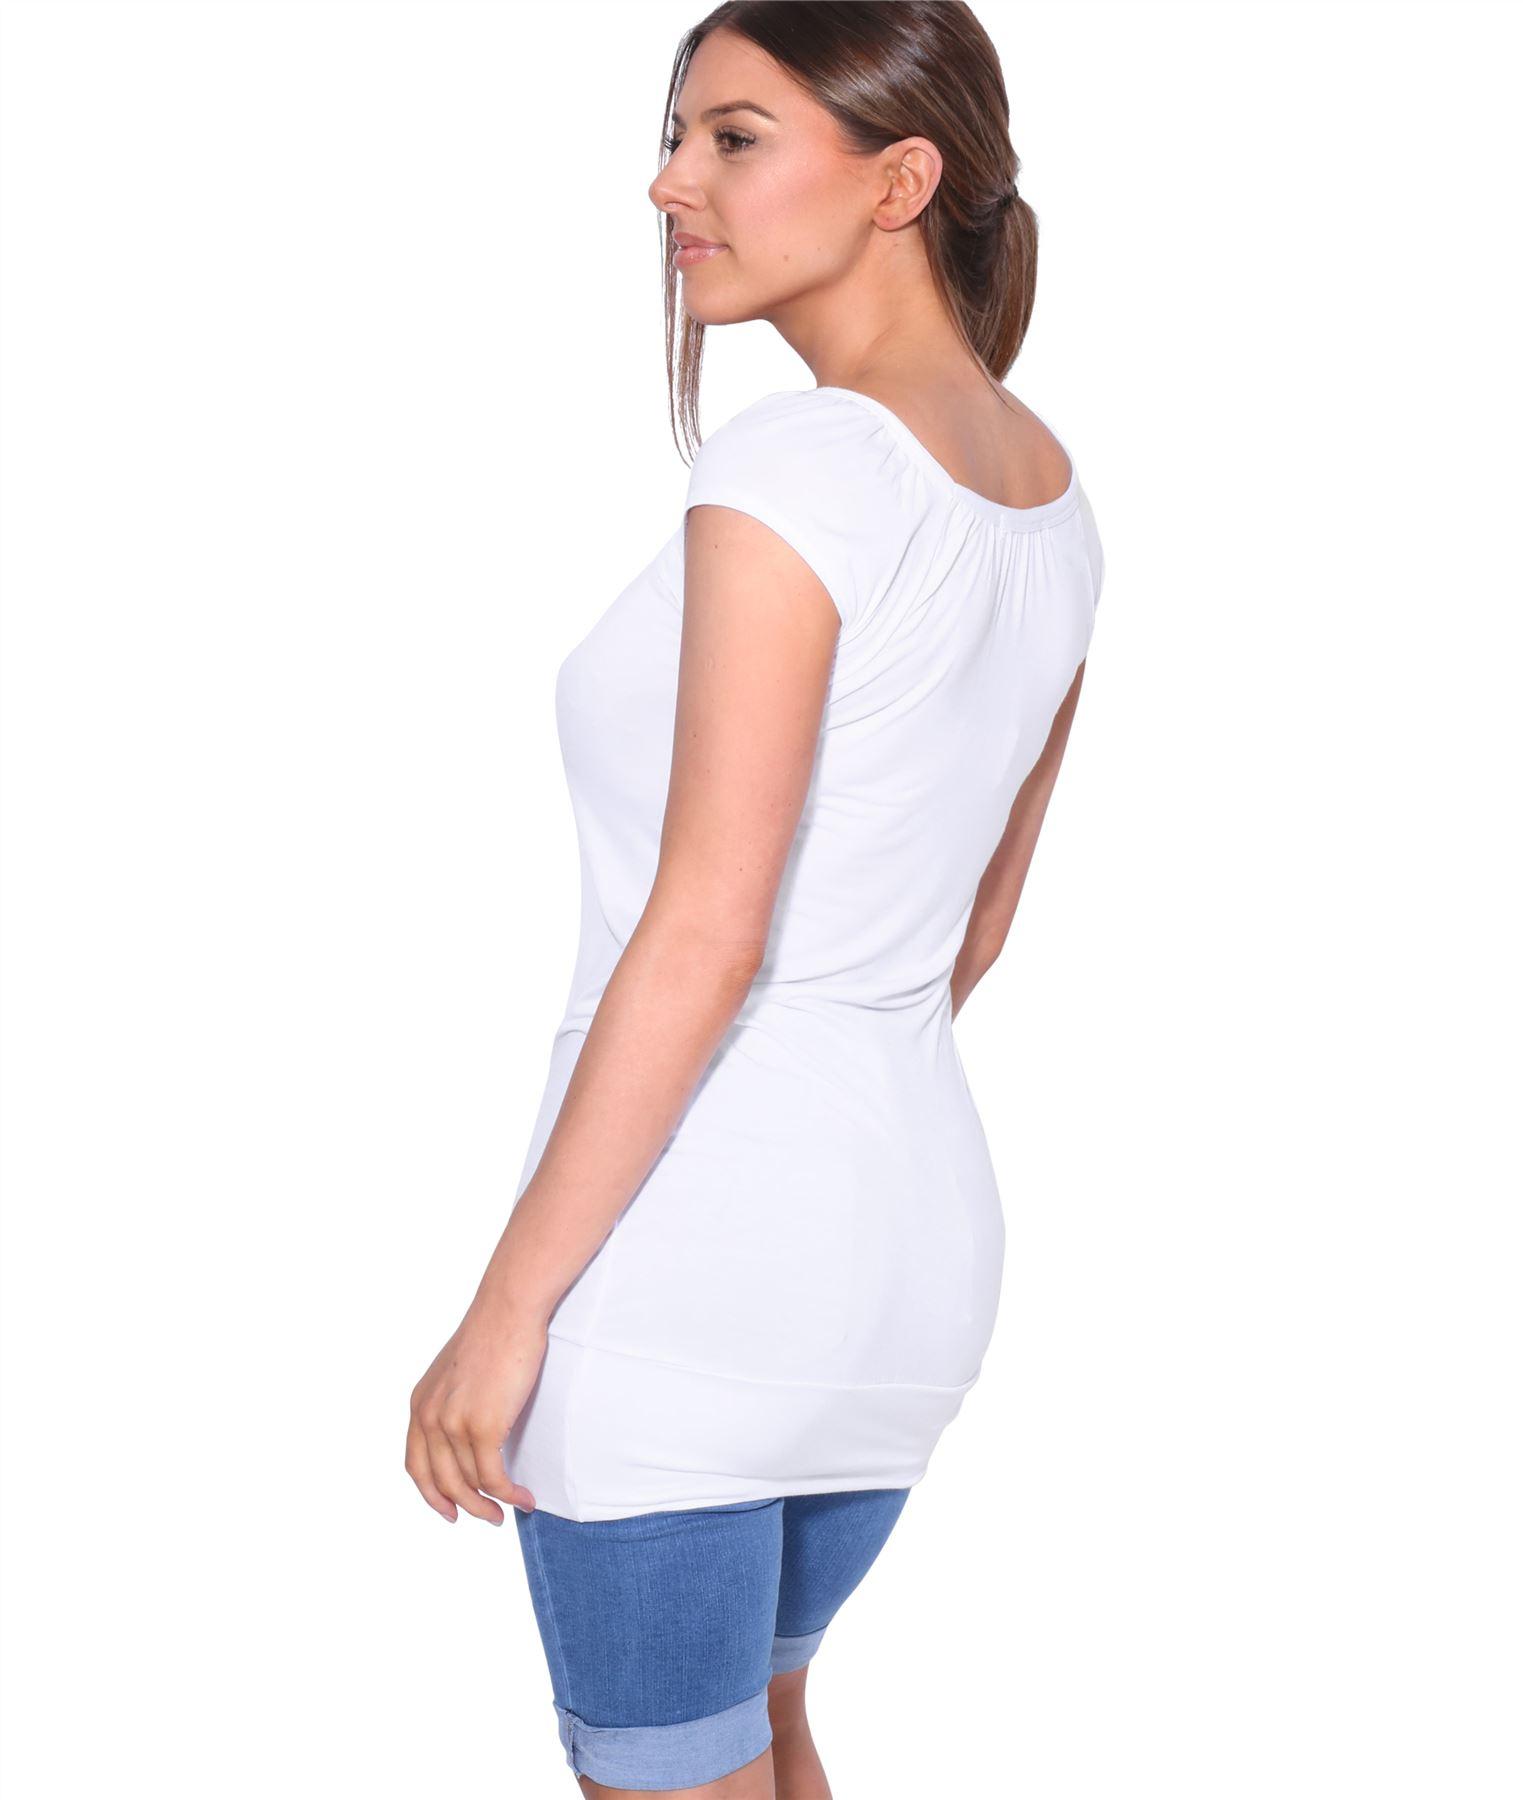 Womens-Ladies-Scoop-Neck-Blouse-V-T-Shirt-Long-Short-Sleeve-Plain-Loose-Top thumbnail 53